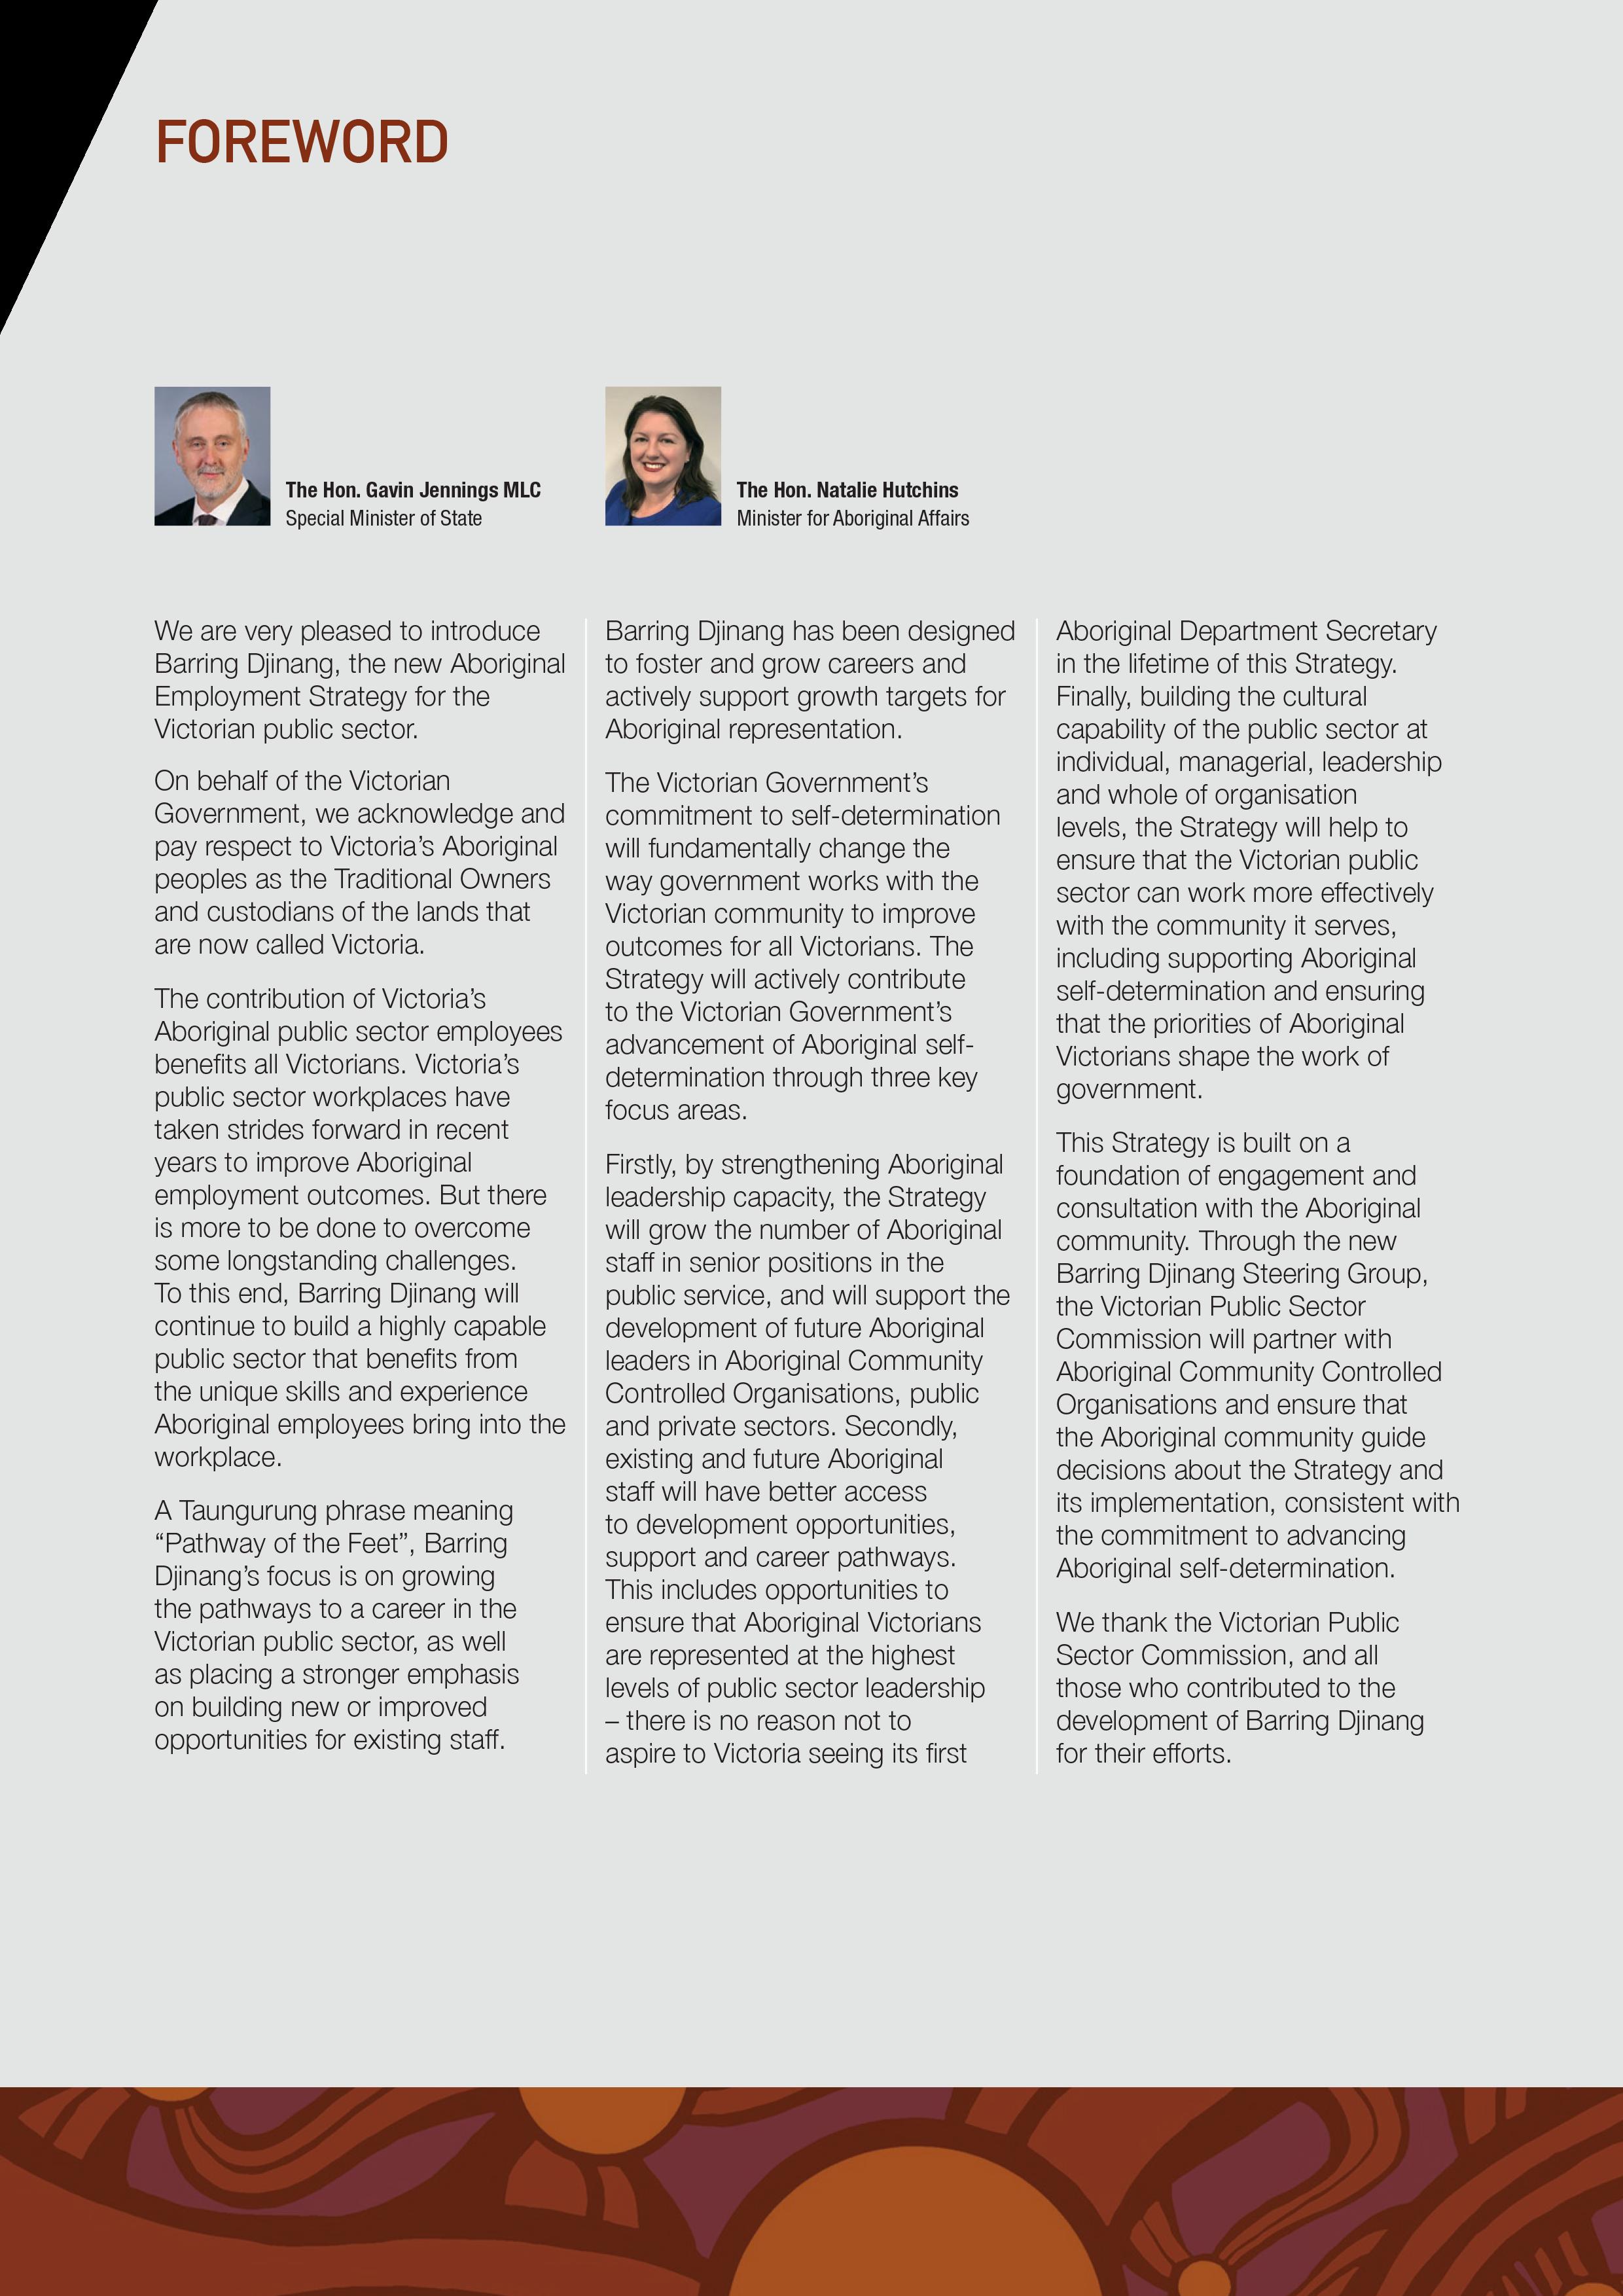 Foreword - Barring Djinang | Strategy Brochure July 2017 - VPSC